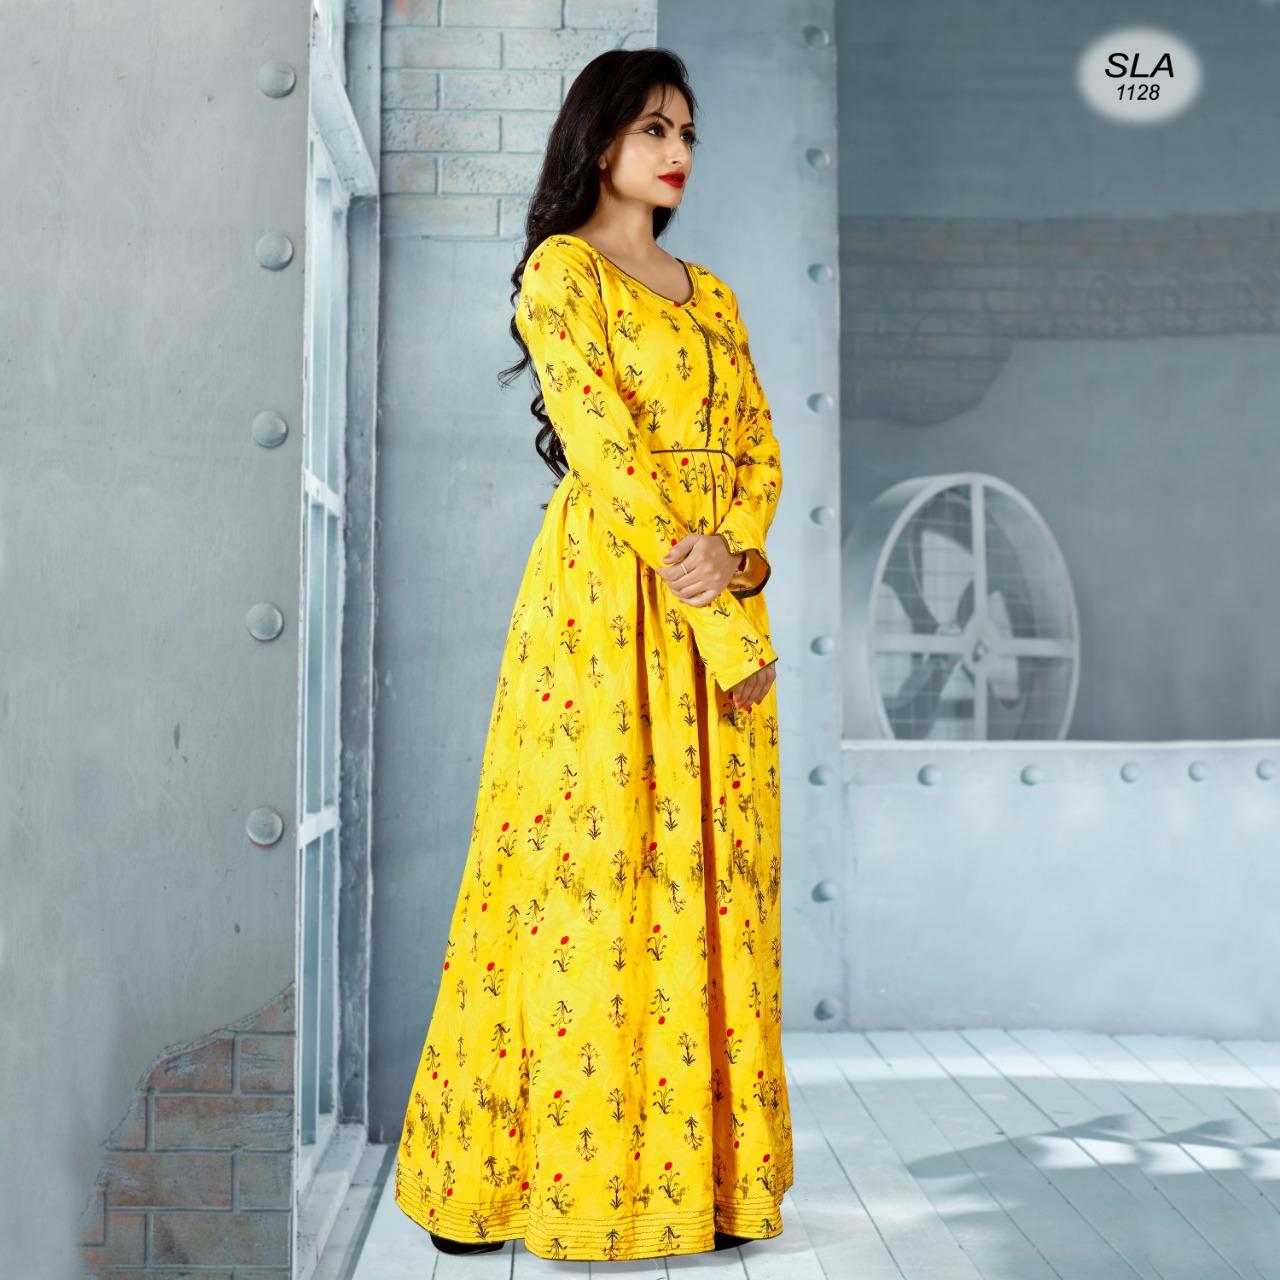 Designer Rayon Flower Print Gown Pettern Kurtis Best Wholesale Rate